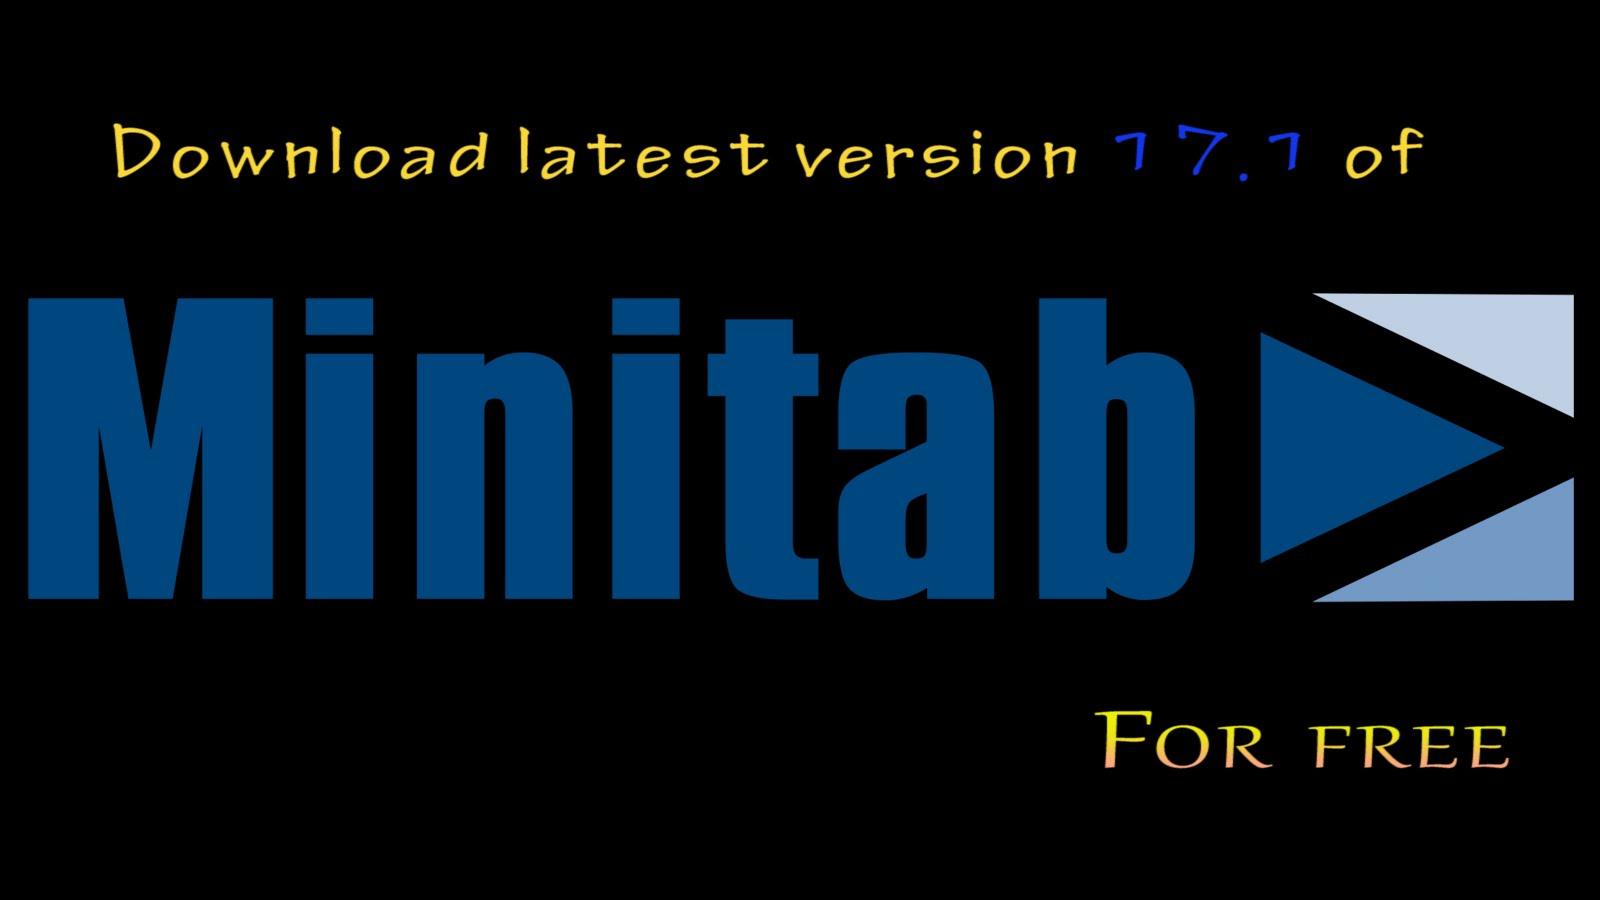 minitab 18 free download with crack